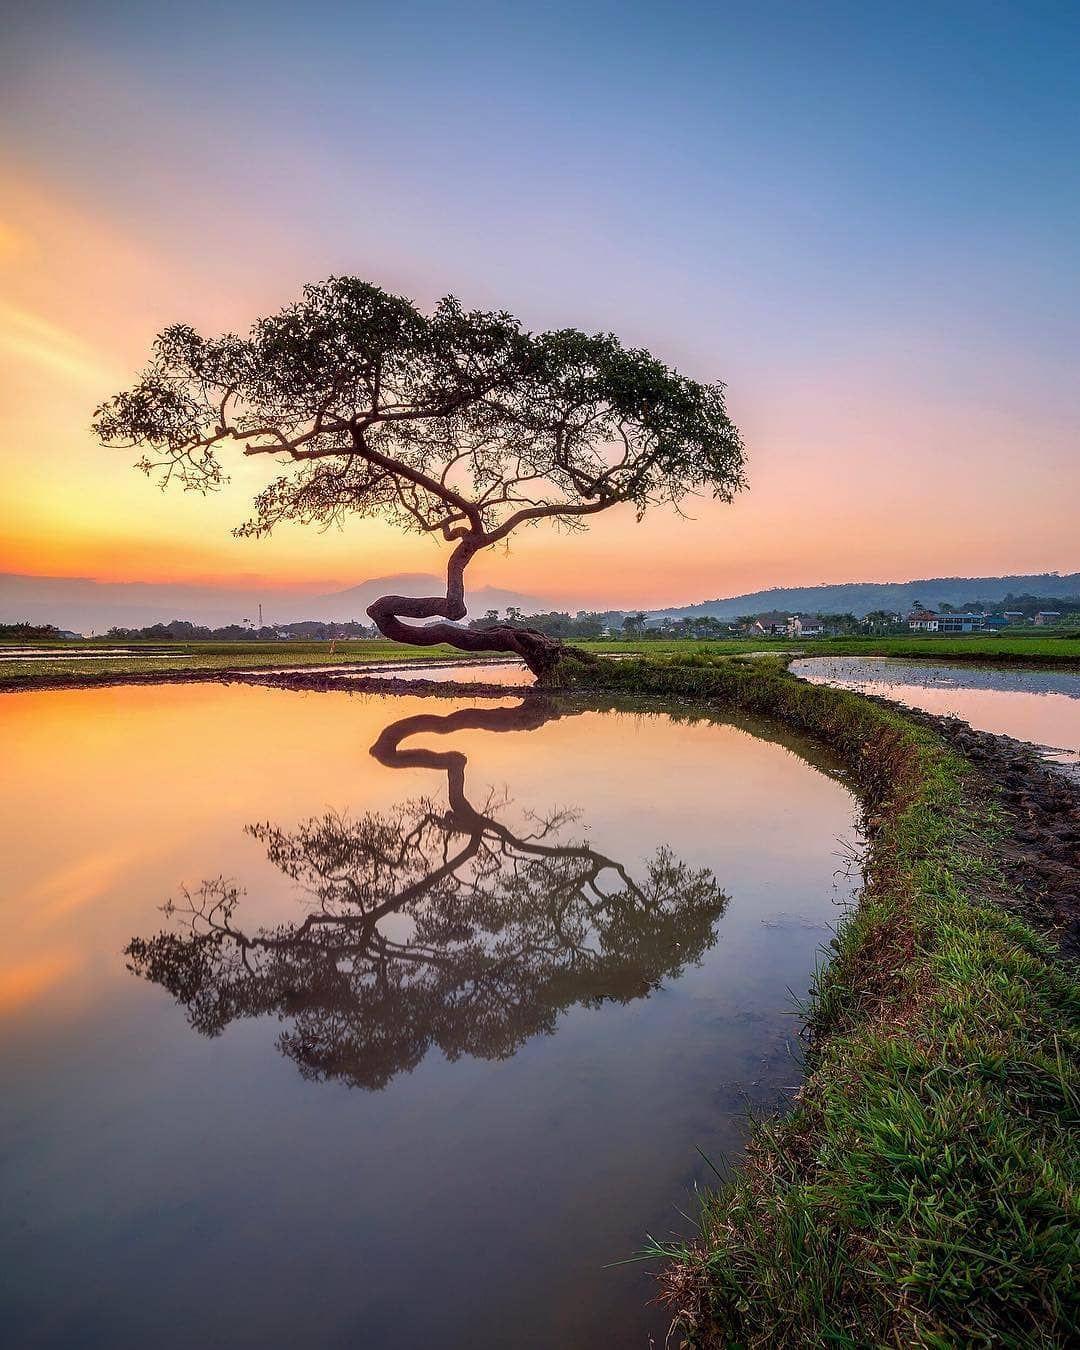 Awesome Photo Trip On Instagram Salatiga Indonesia Paysage Paysage De Reve Photos Paysage